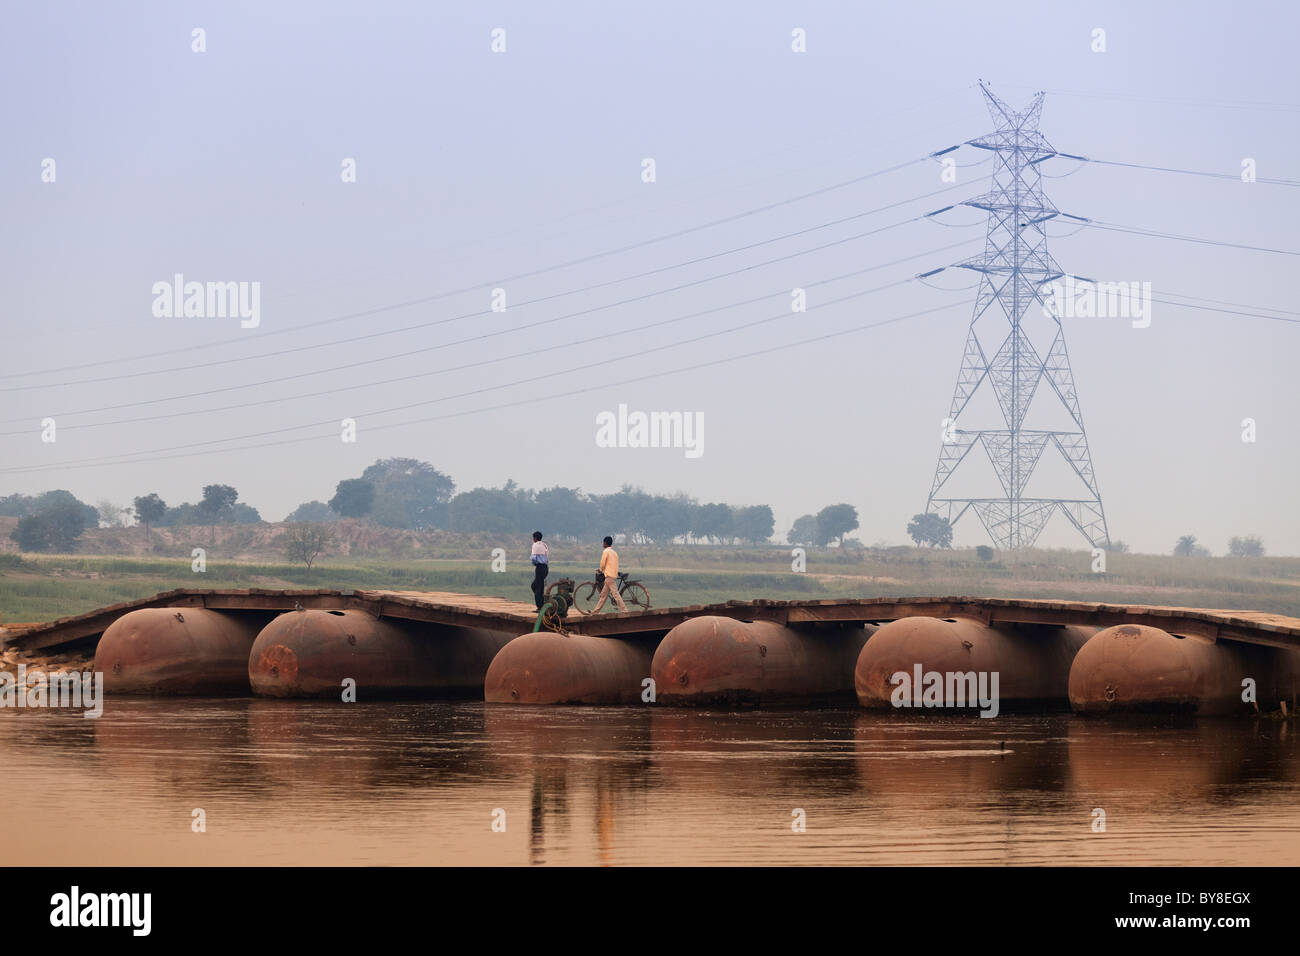 India, Uttar Pradesh, Agra, two men crossing pontoon bridge over Yamuna River - Stock Image